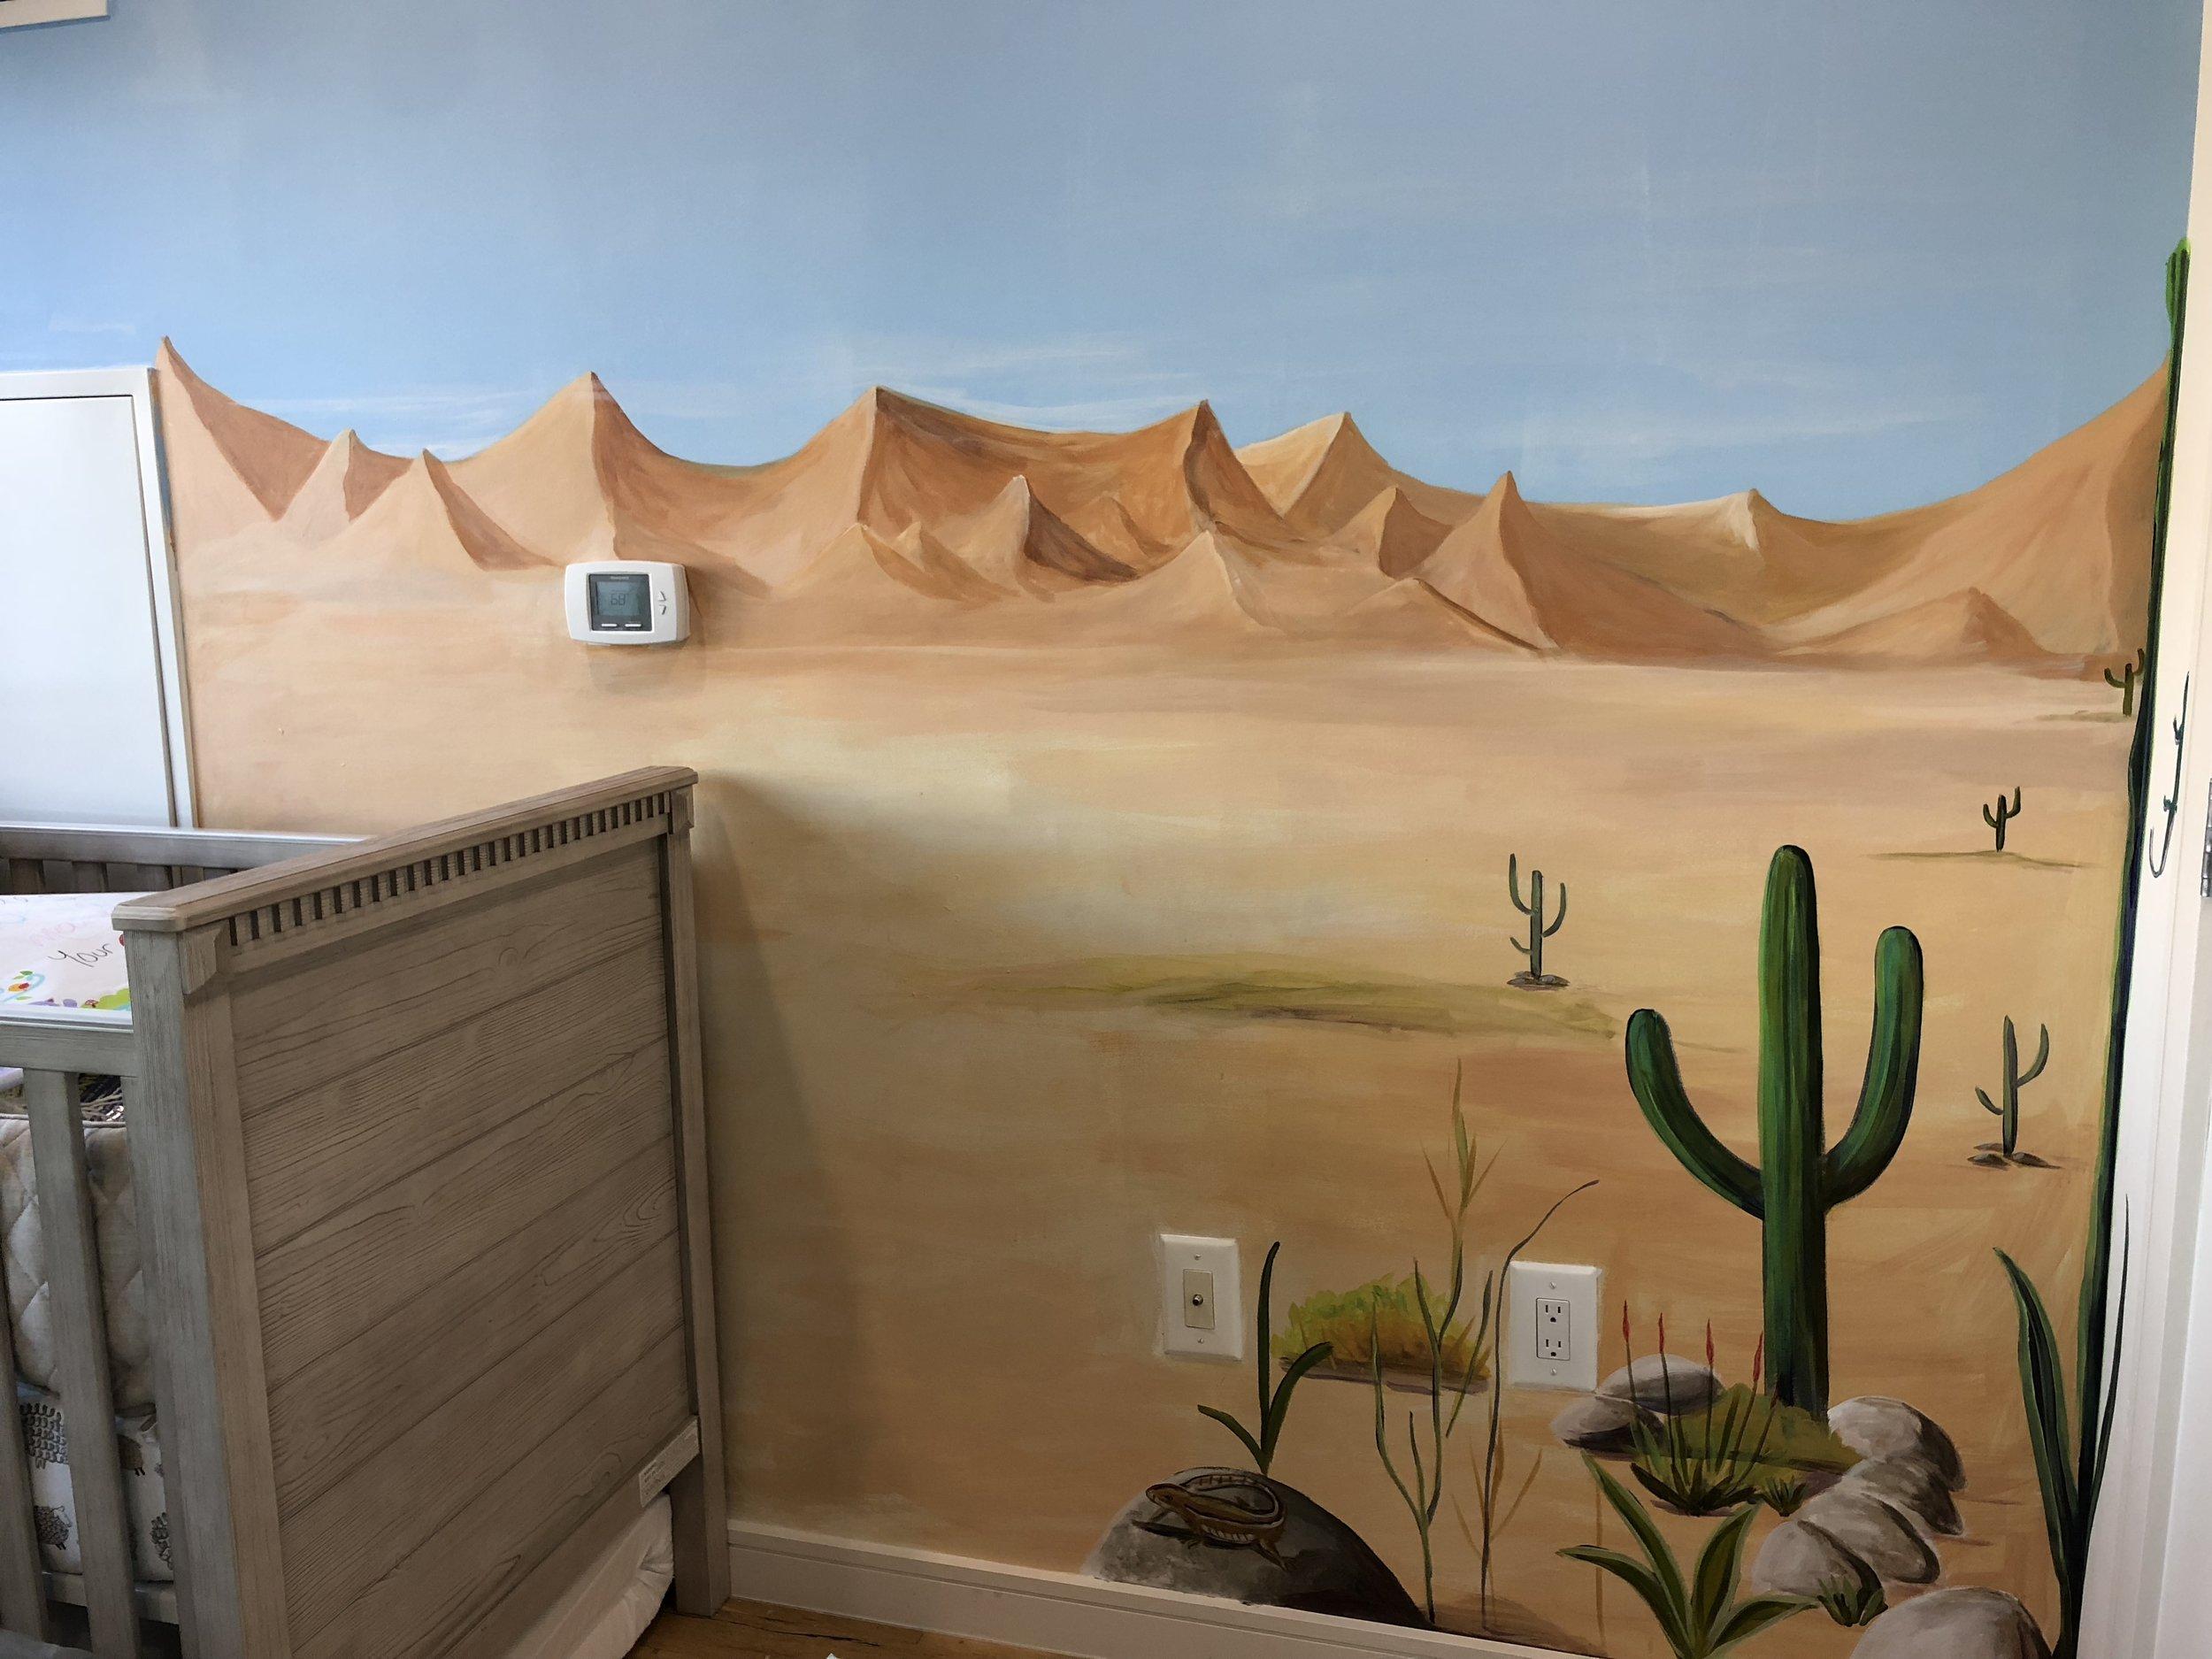 Desert mural in a nursery